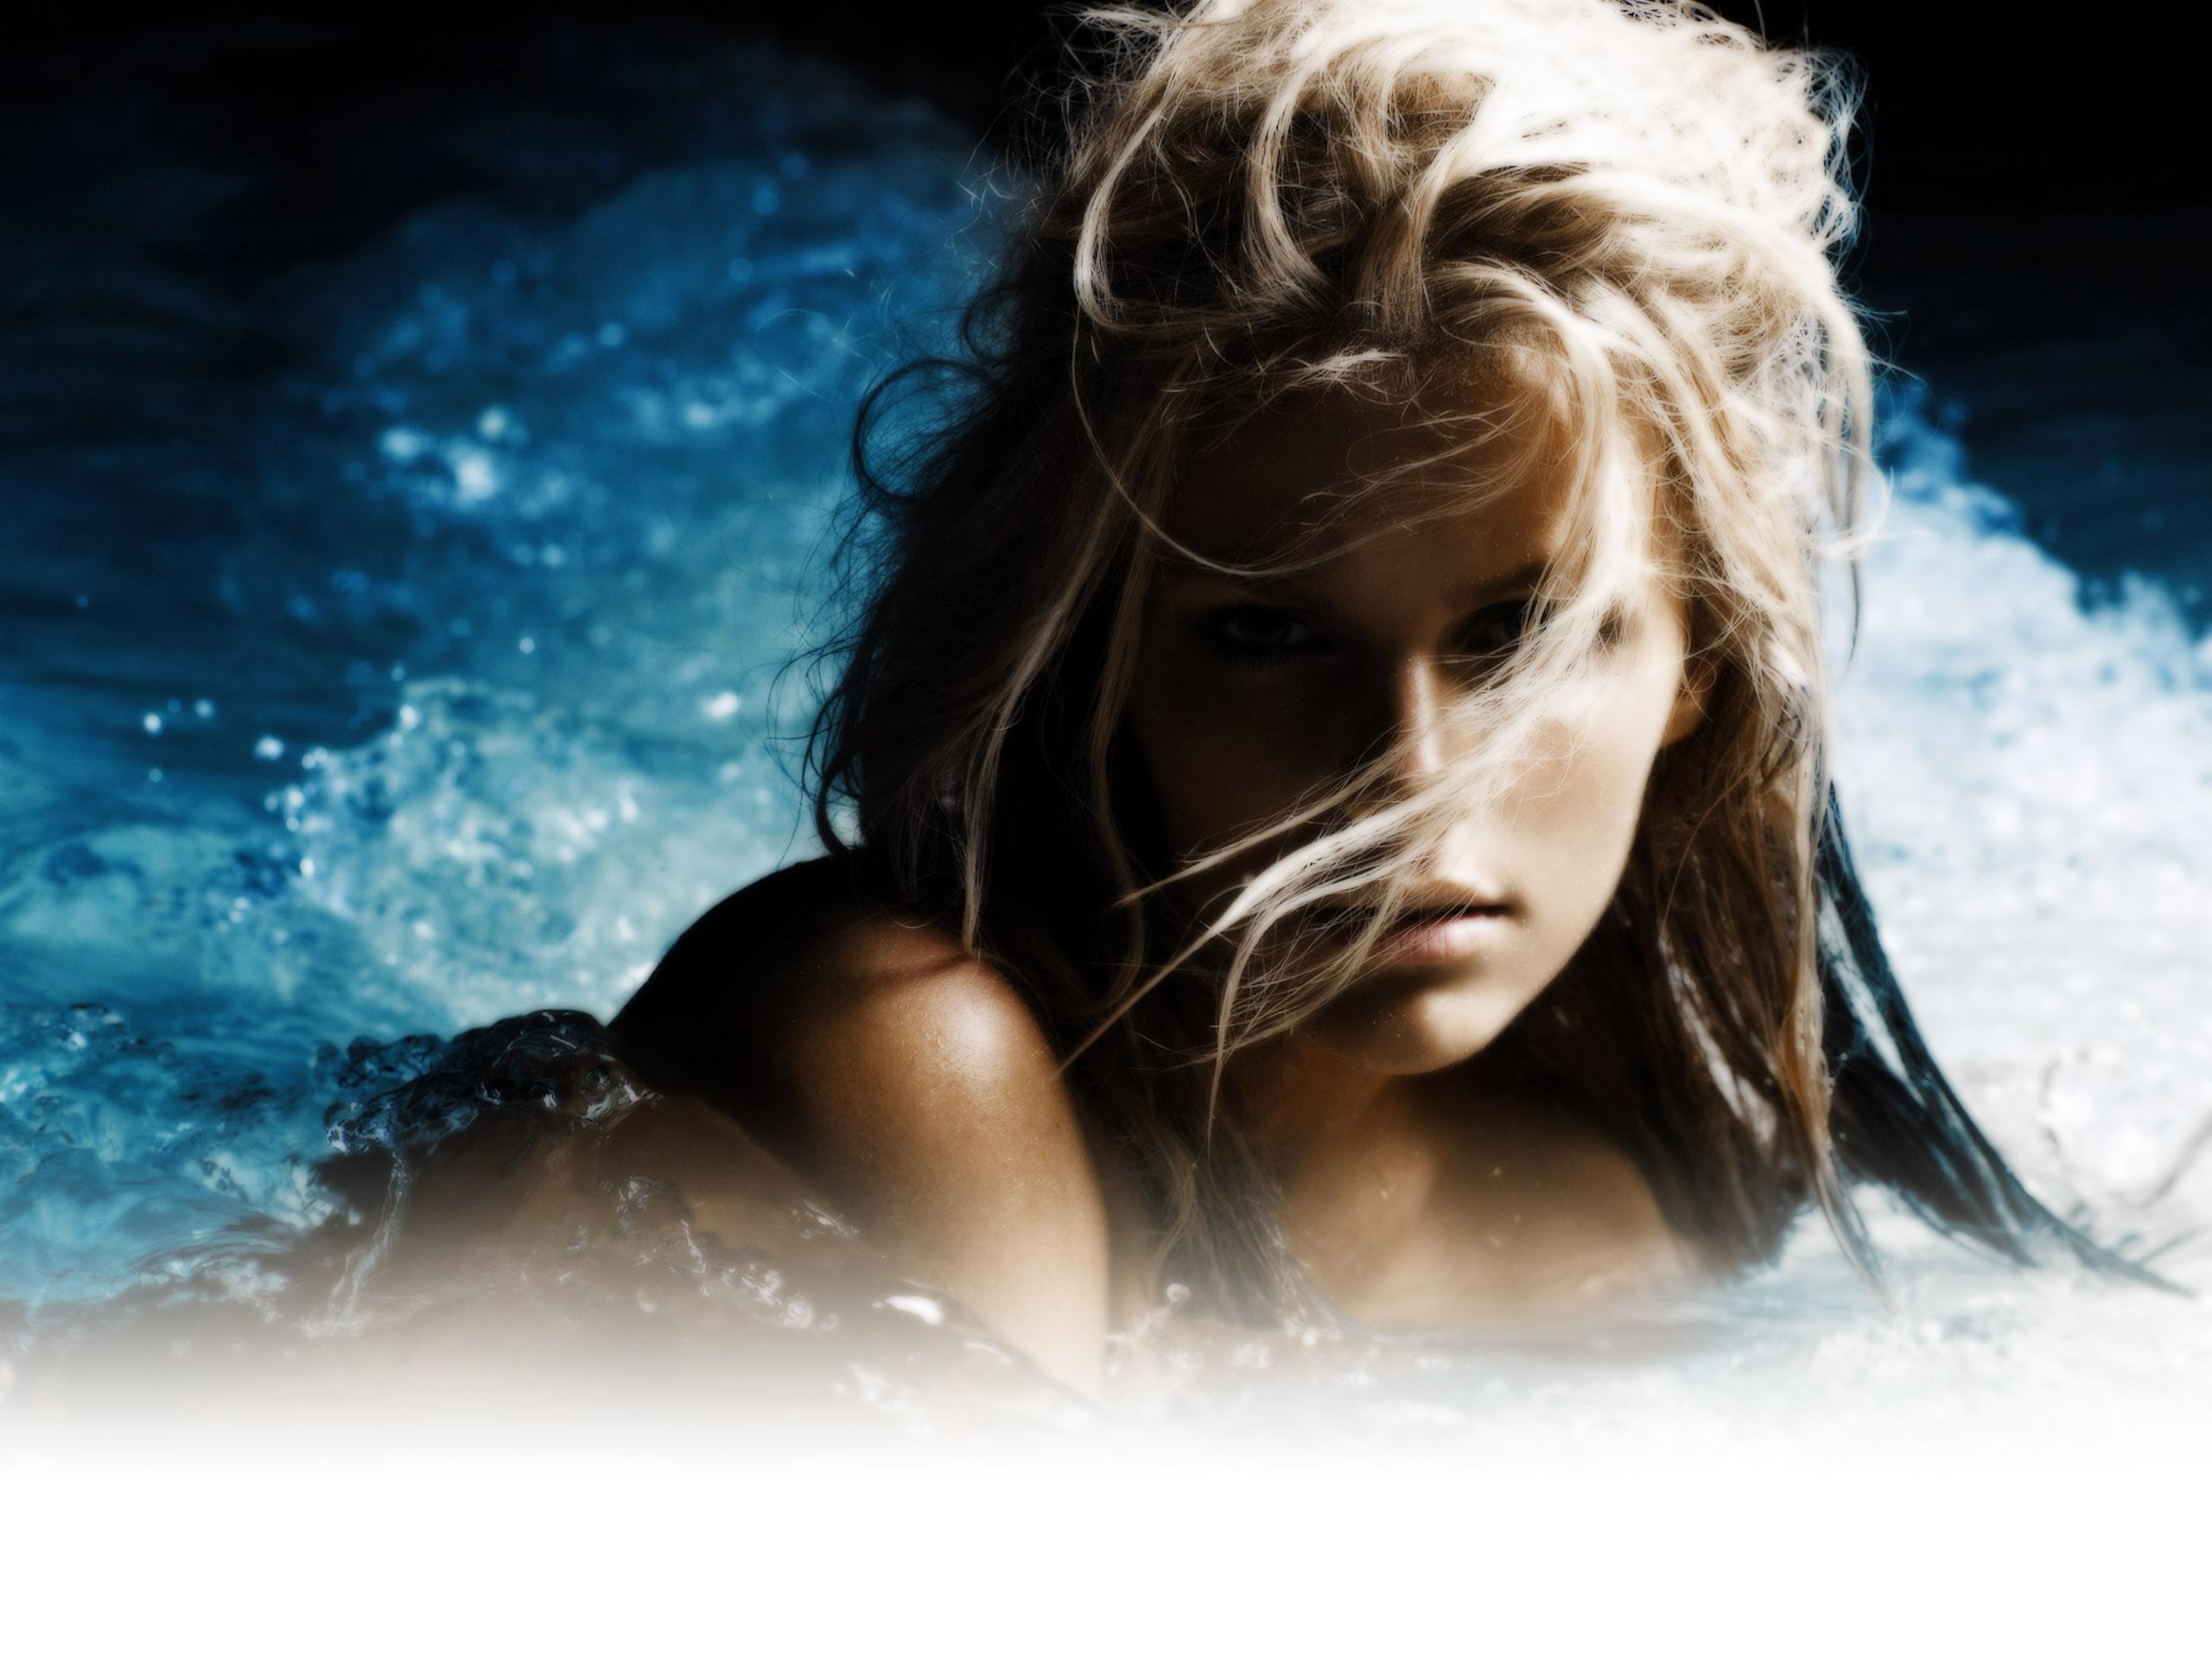 Фото девушки в воде 10 фотография